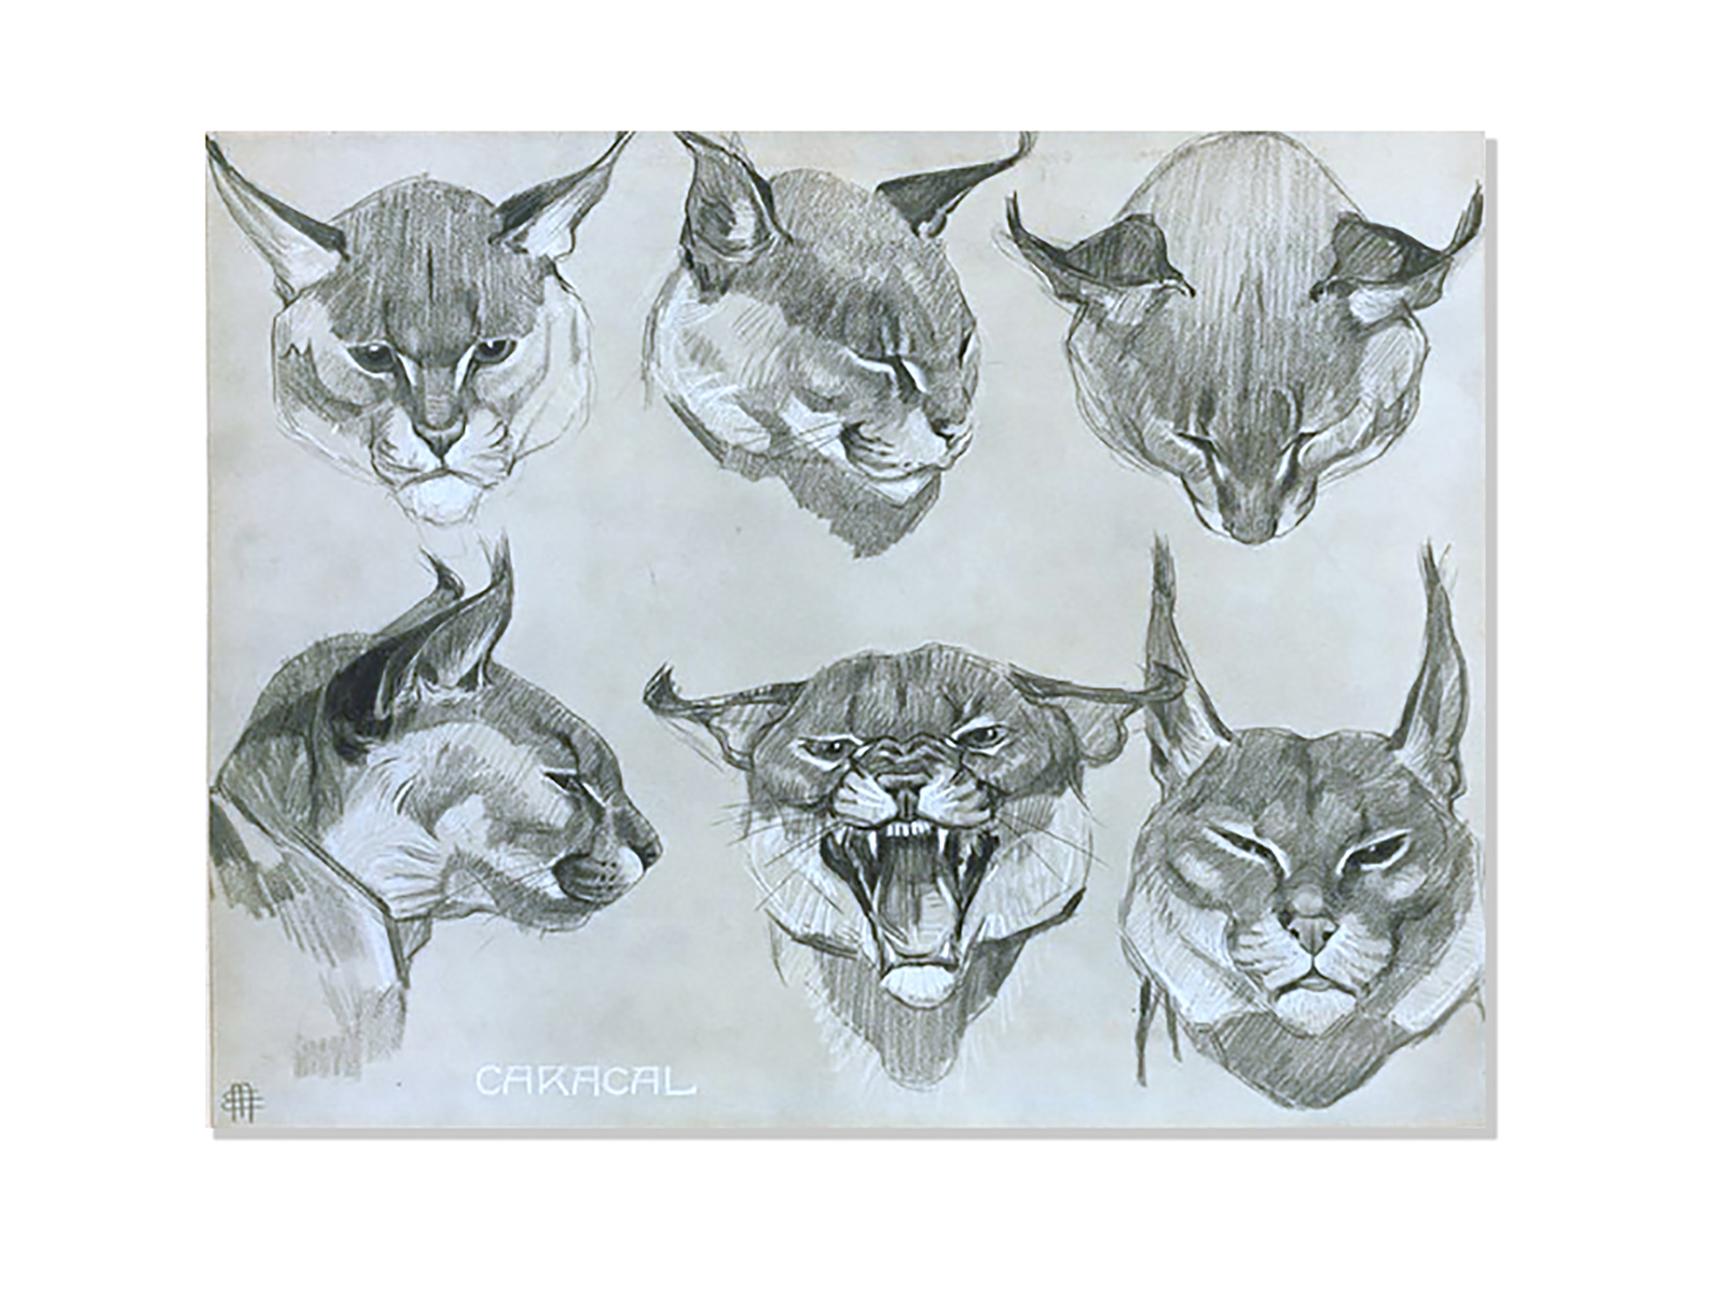 Caracal - Études d'animaux, de Méheut, Mathurin, 1882-1958 (Artist) - The Digital Public Library of America-NYPL catalog ID (B-number): b13983745